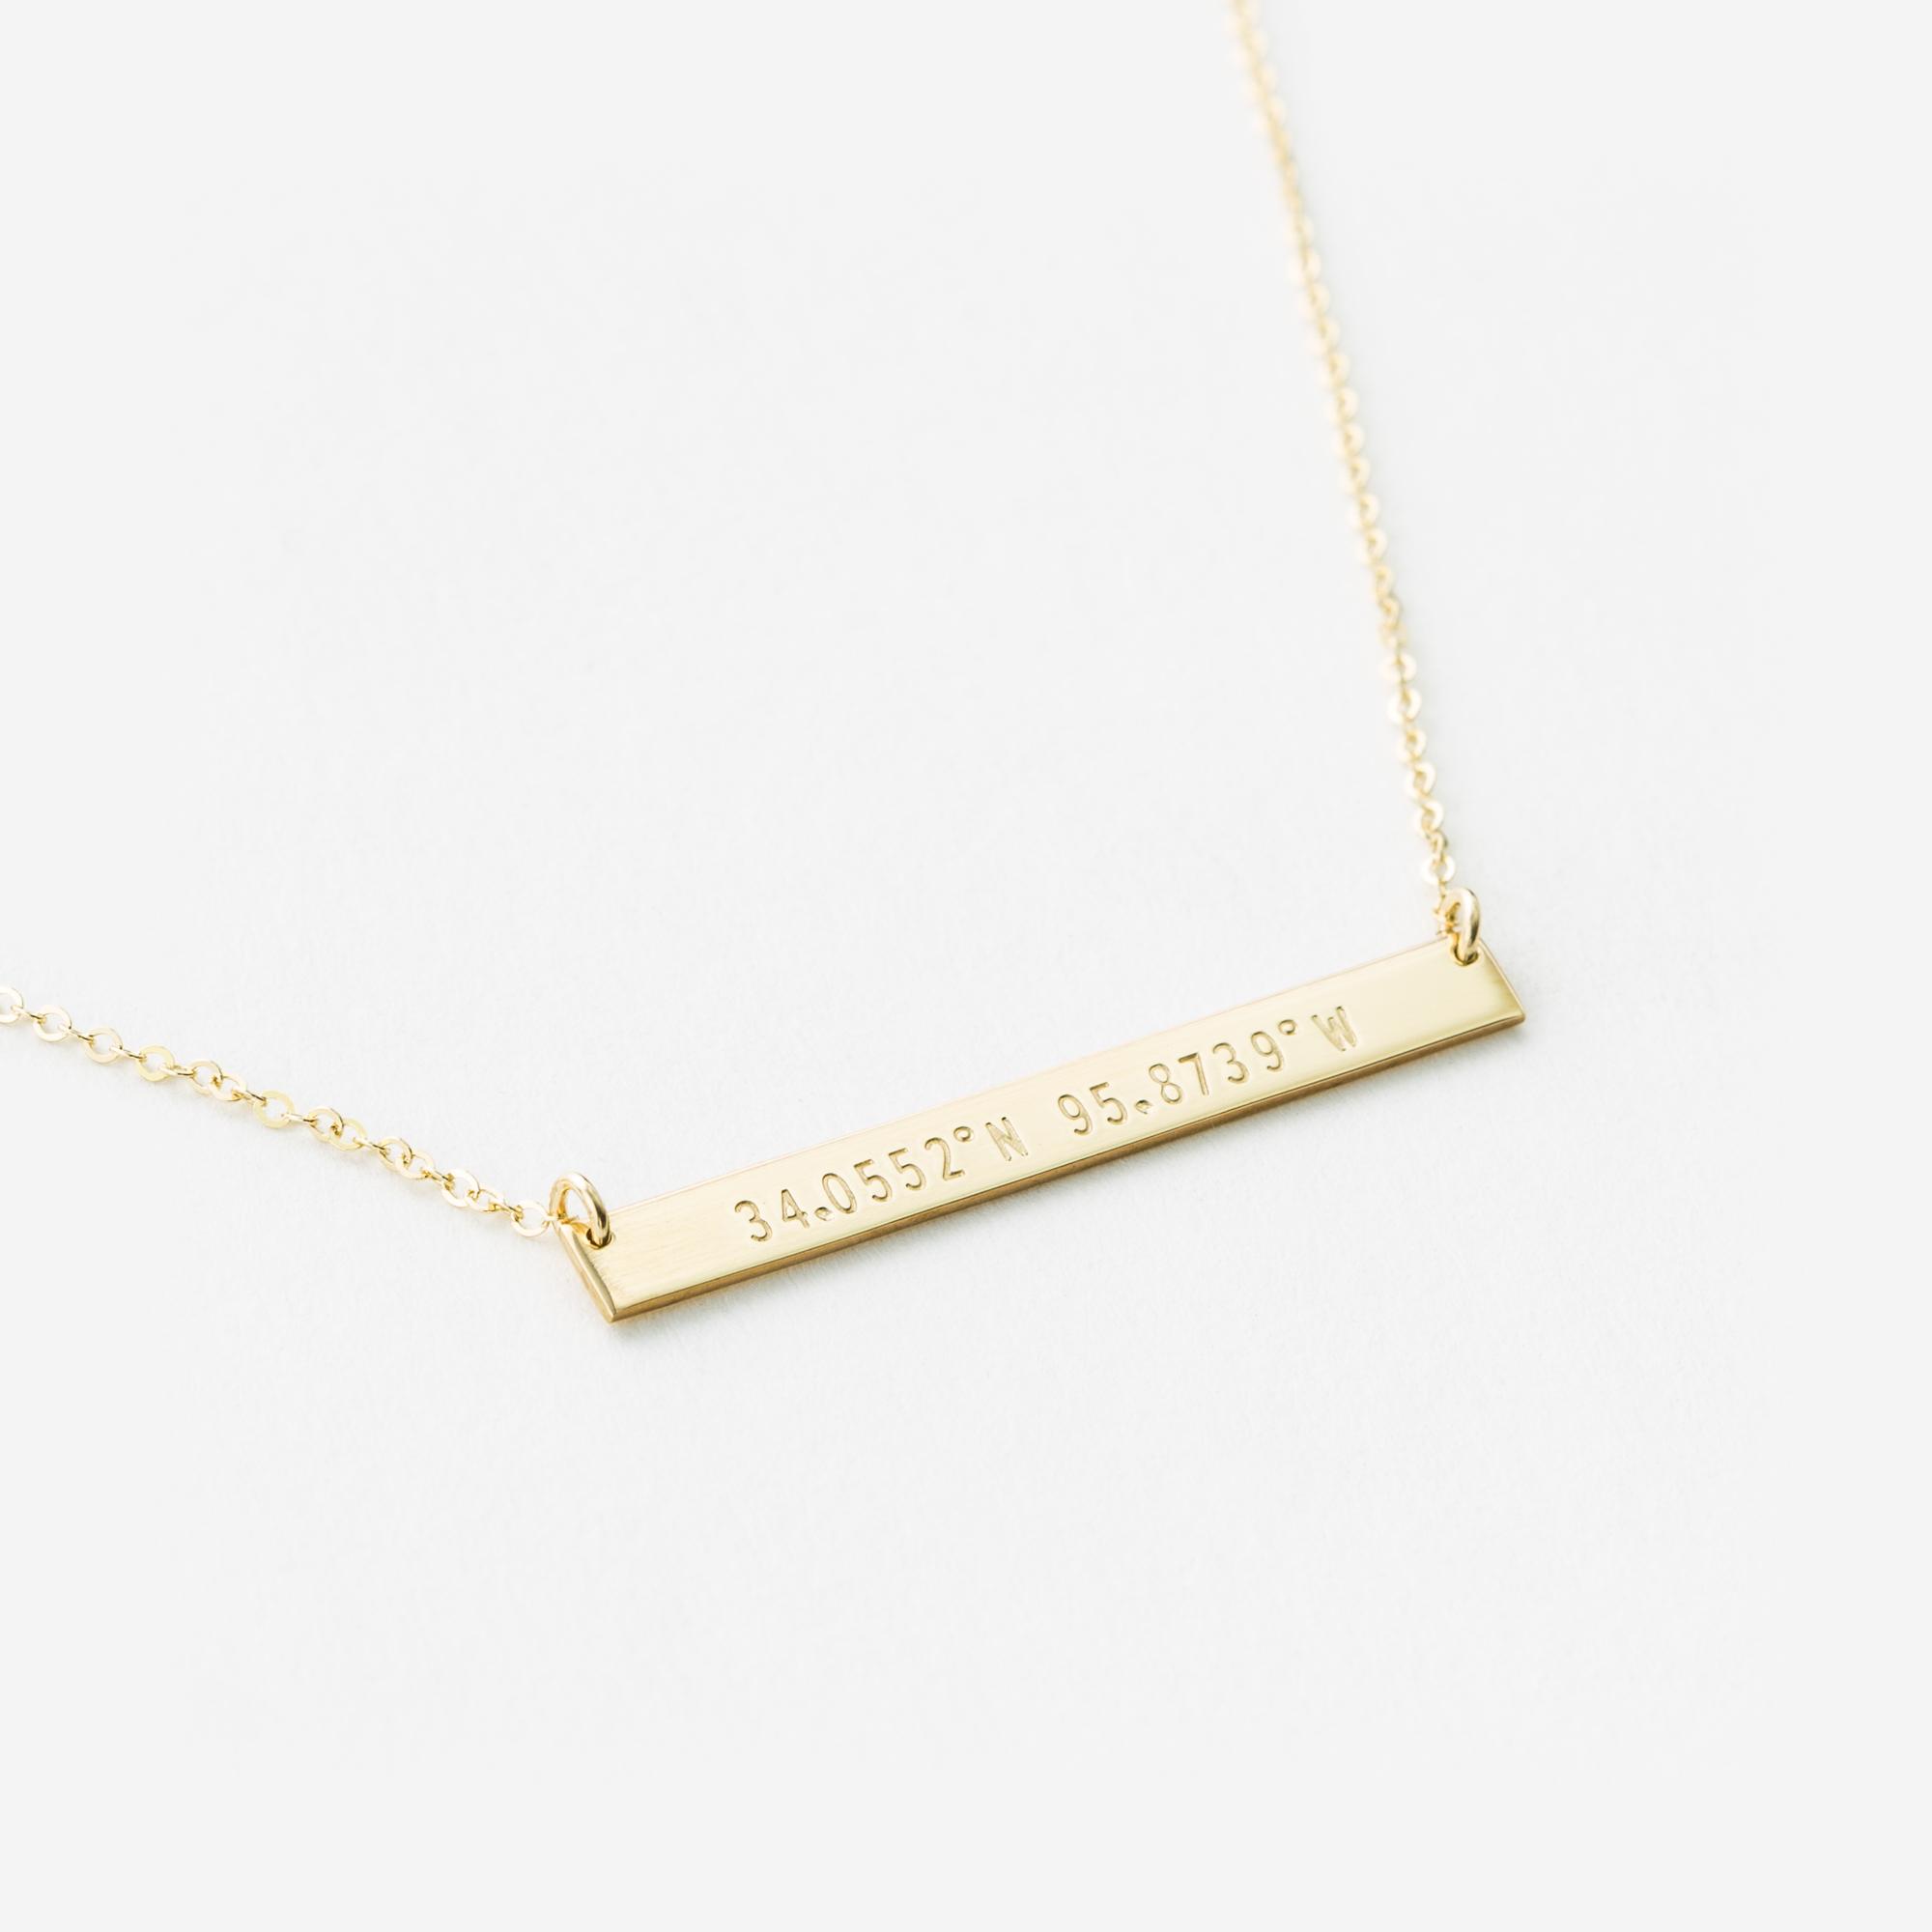 6c86eeec4b057 Custom Coordinates Necklace — GLDN